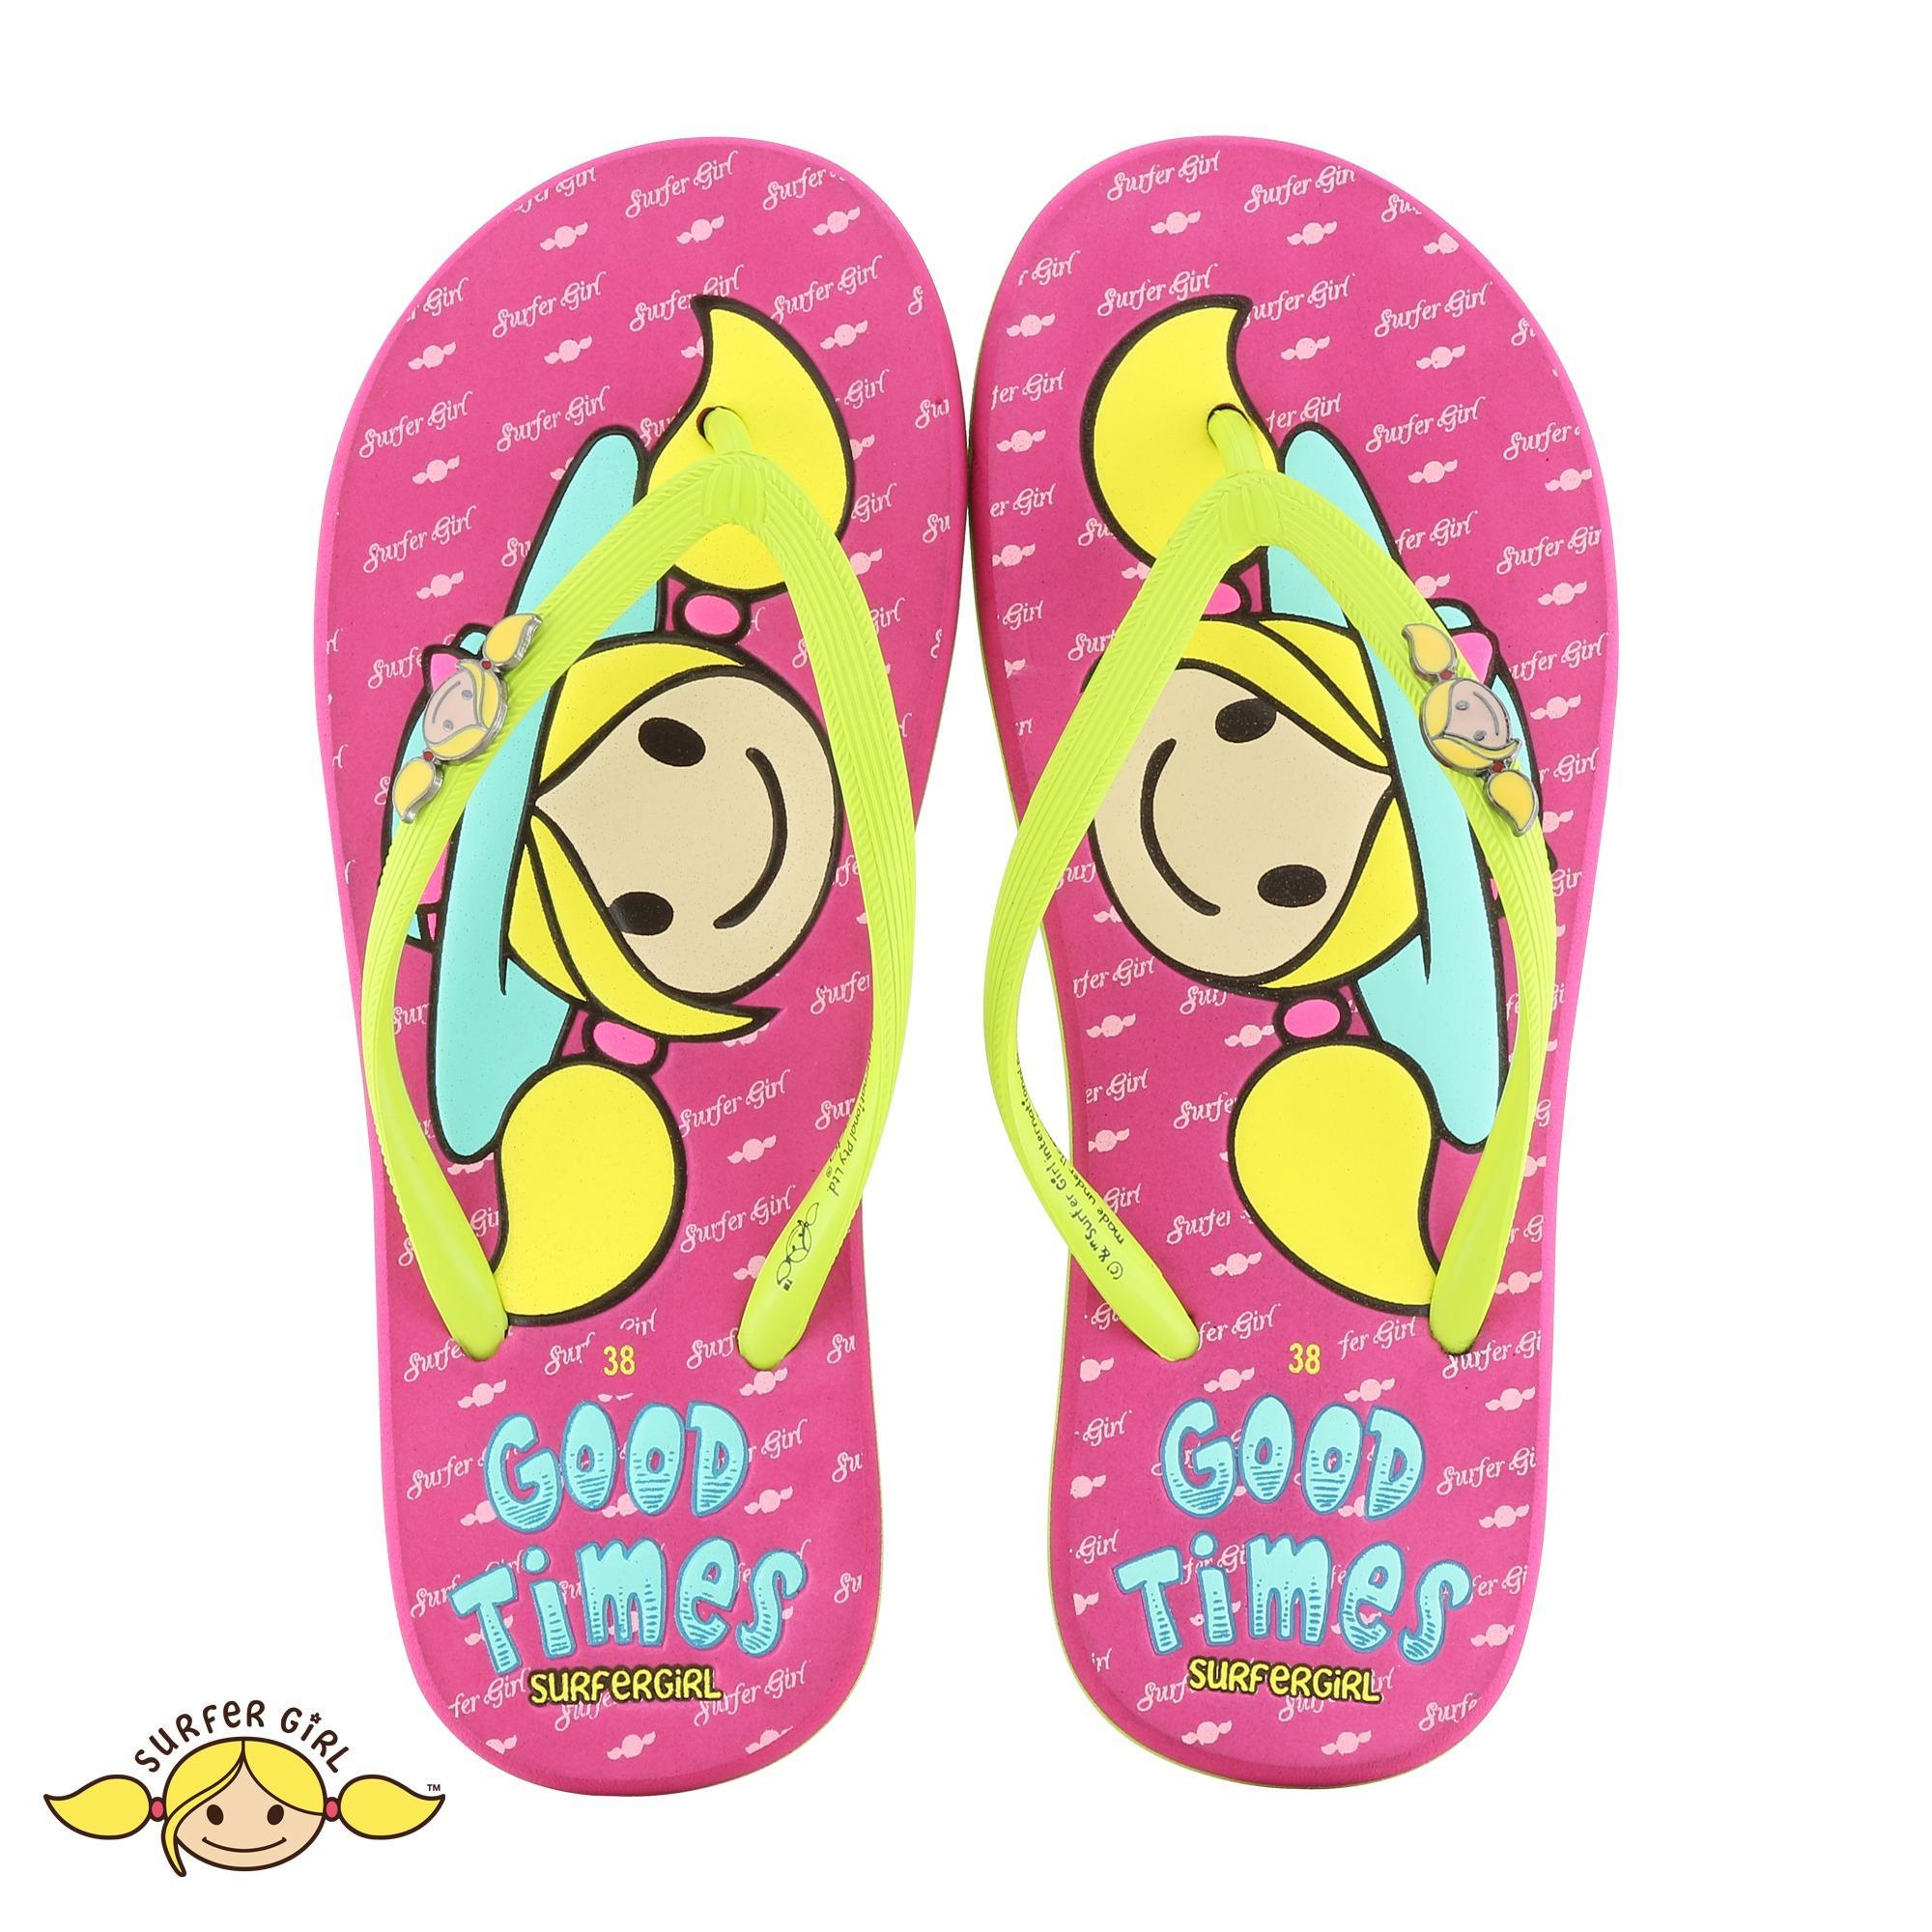 Toko Sandal Flip Flop Surfer G*rl Limited Edition Sgl 481 Lime Fusia Termurah Indonesia